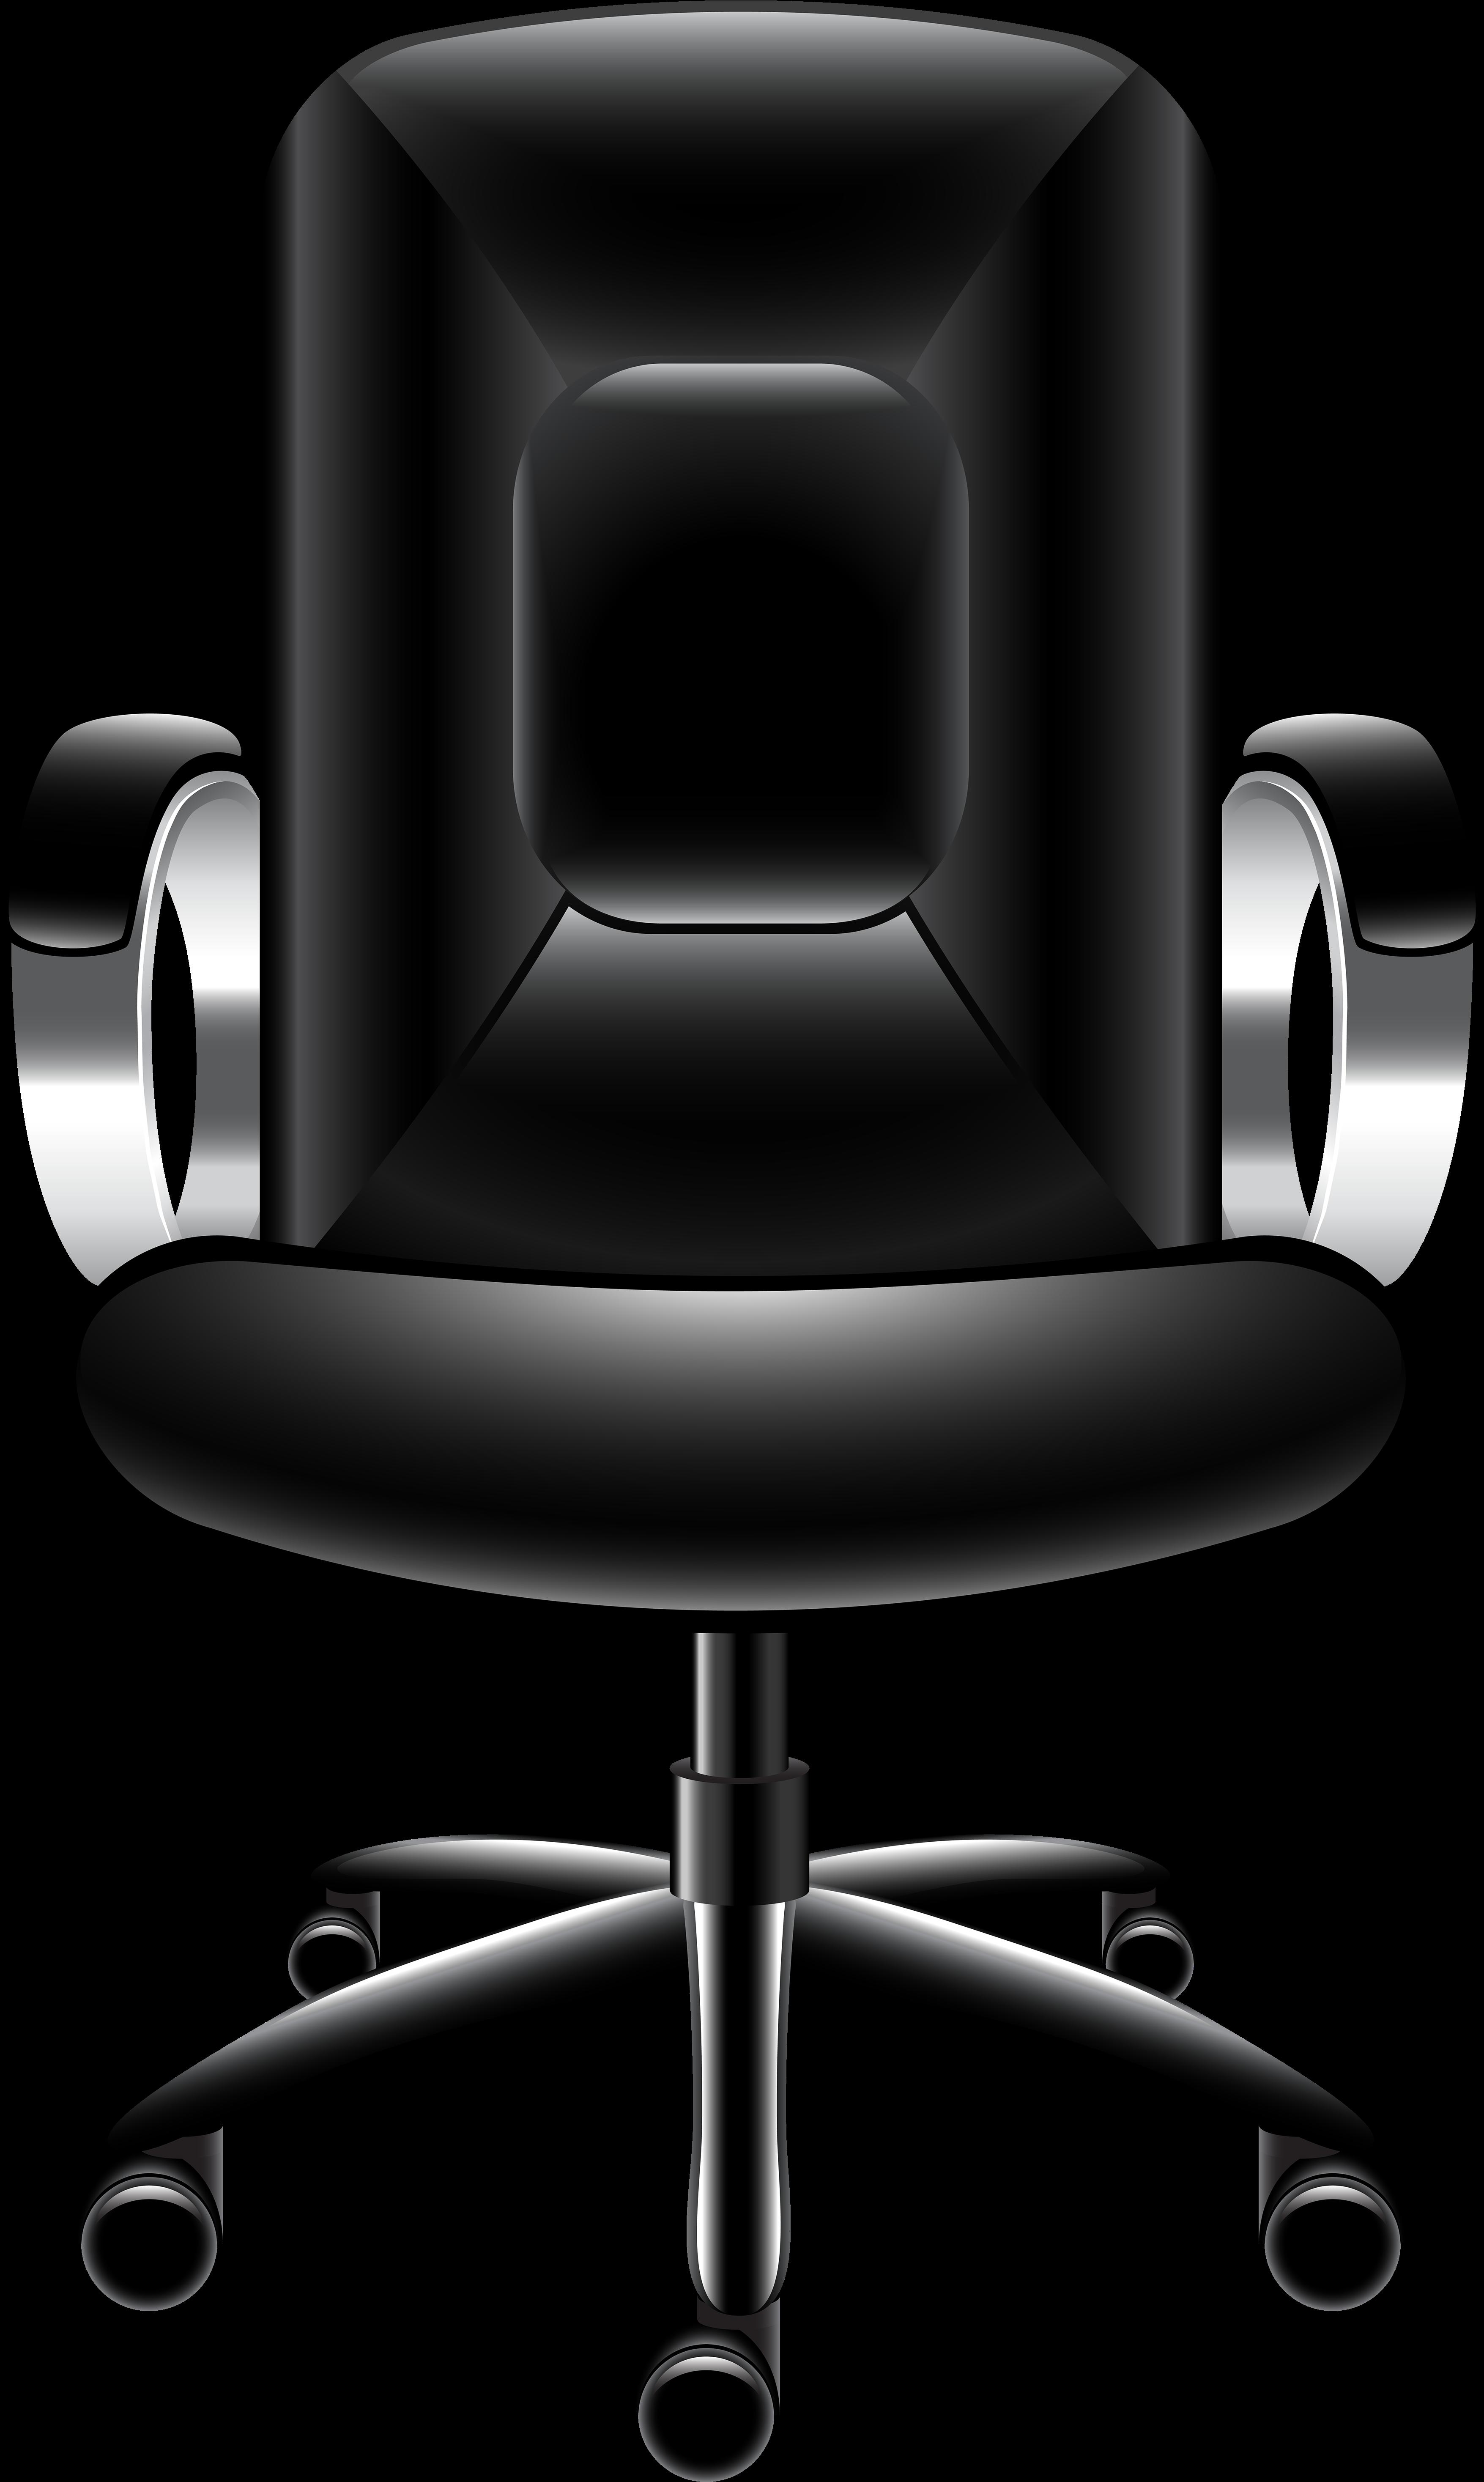 Desk Chair Clip Art.